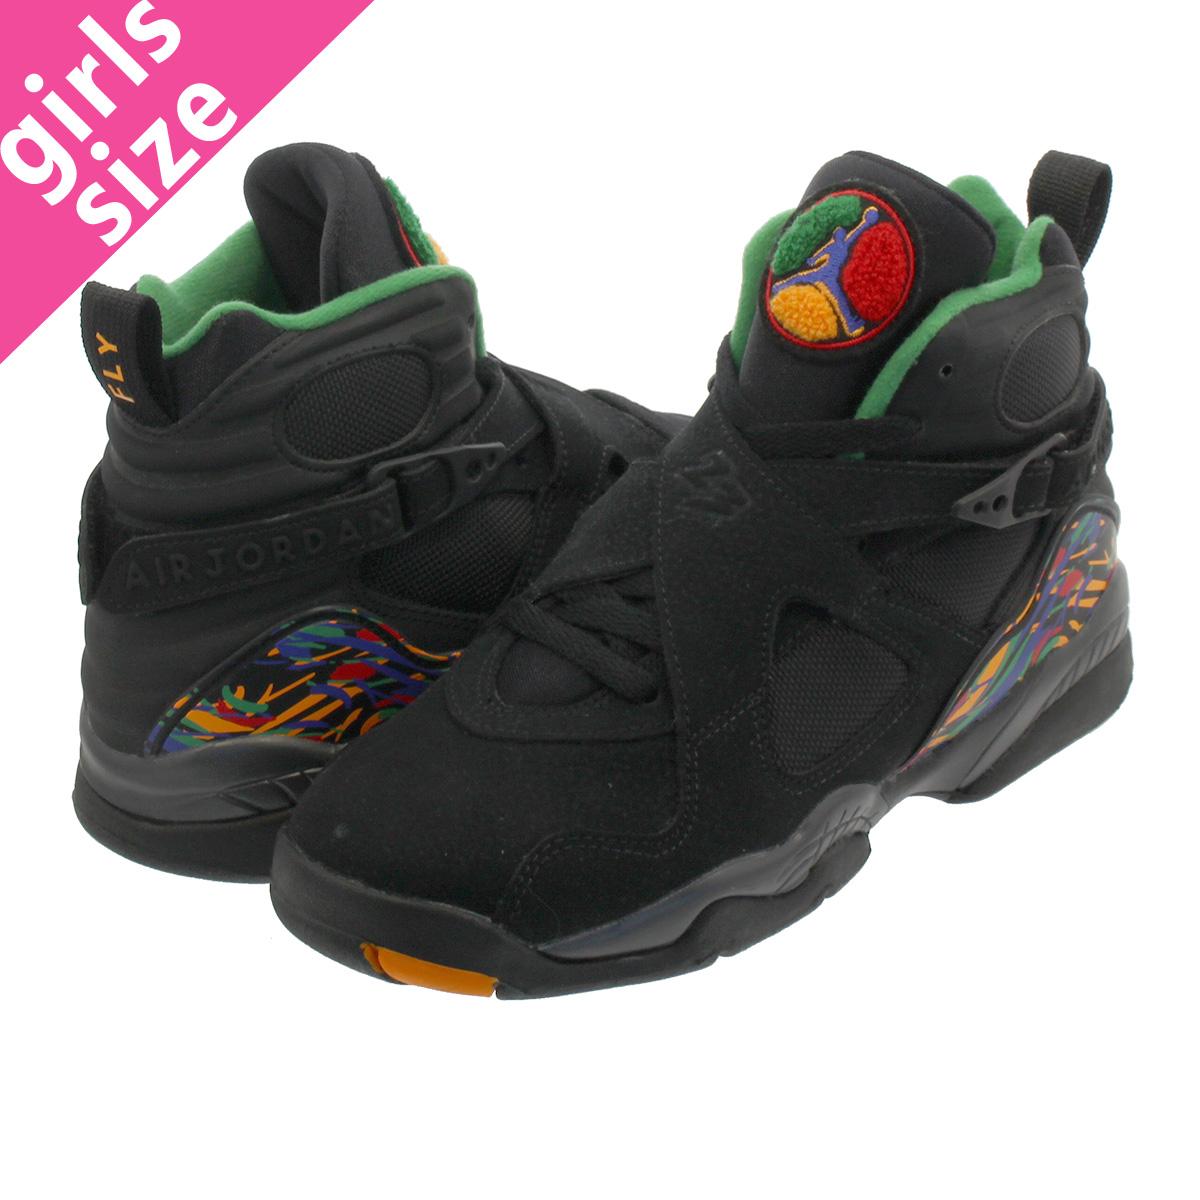 official photos 1ad3b cba32 NIKE AIR JORDAN 8 RETRO GS Nike Air Jordan 8 nostalgic GS BLACK/LIGHT  CONCORD/ALOE VERDE 305,368-004